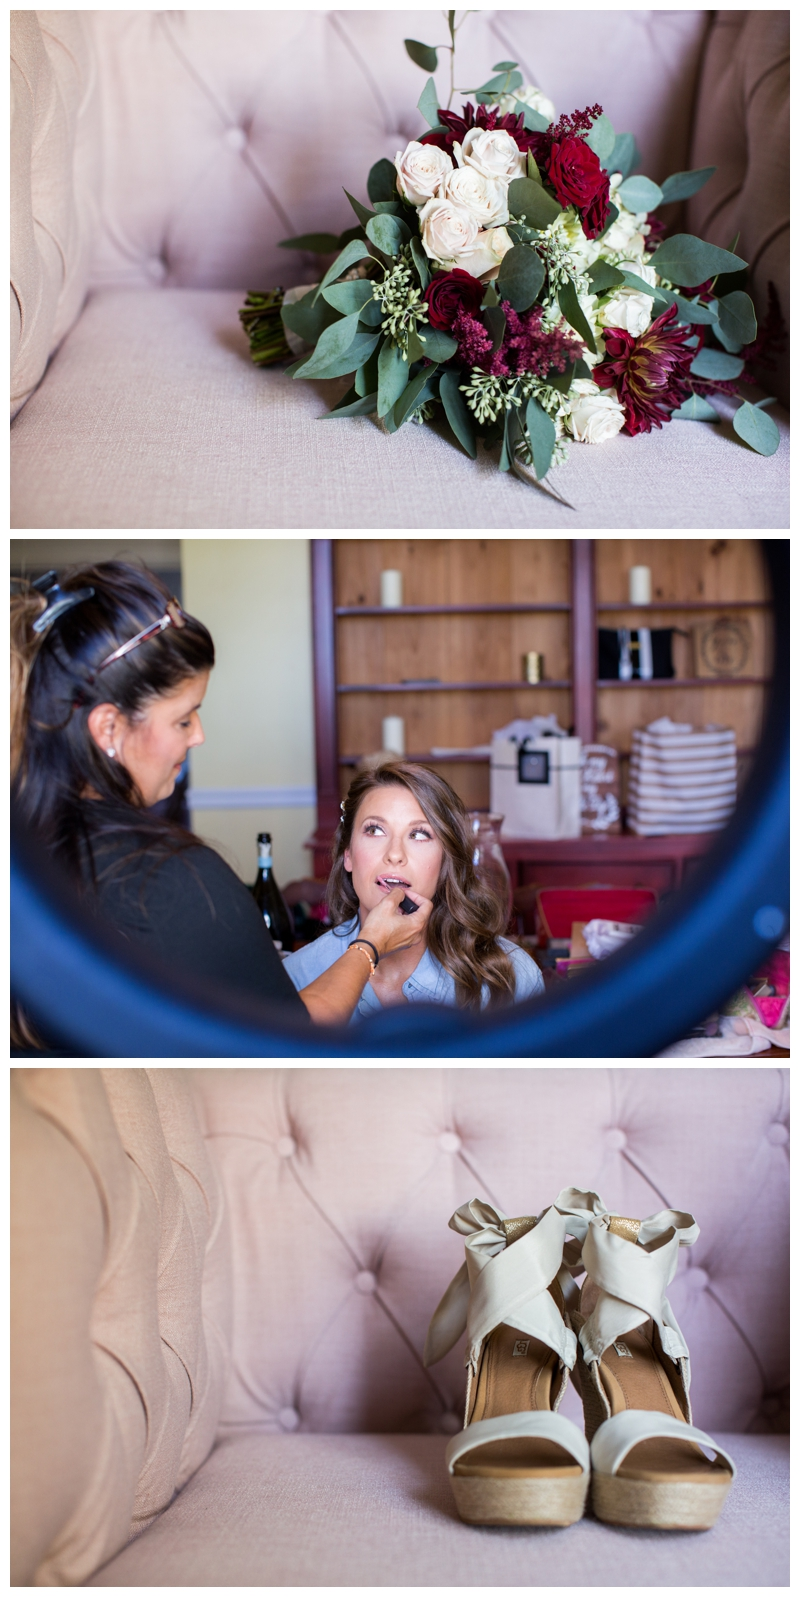 unionville-vineyards-wedding-styled-pink-photography-1.jpg